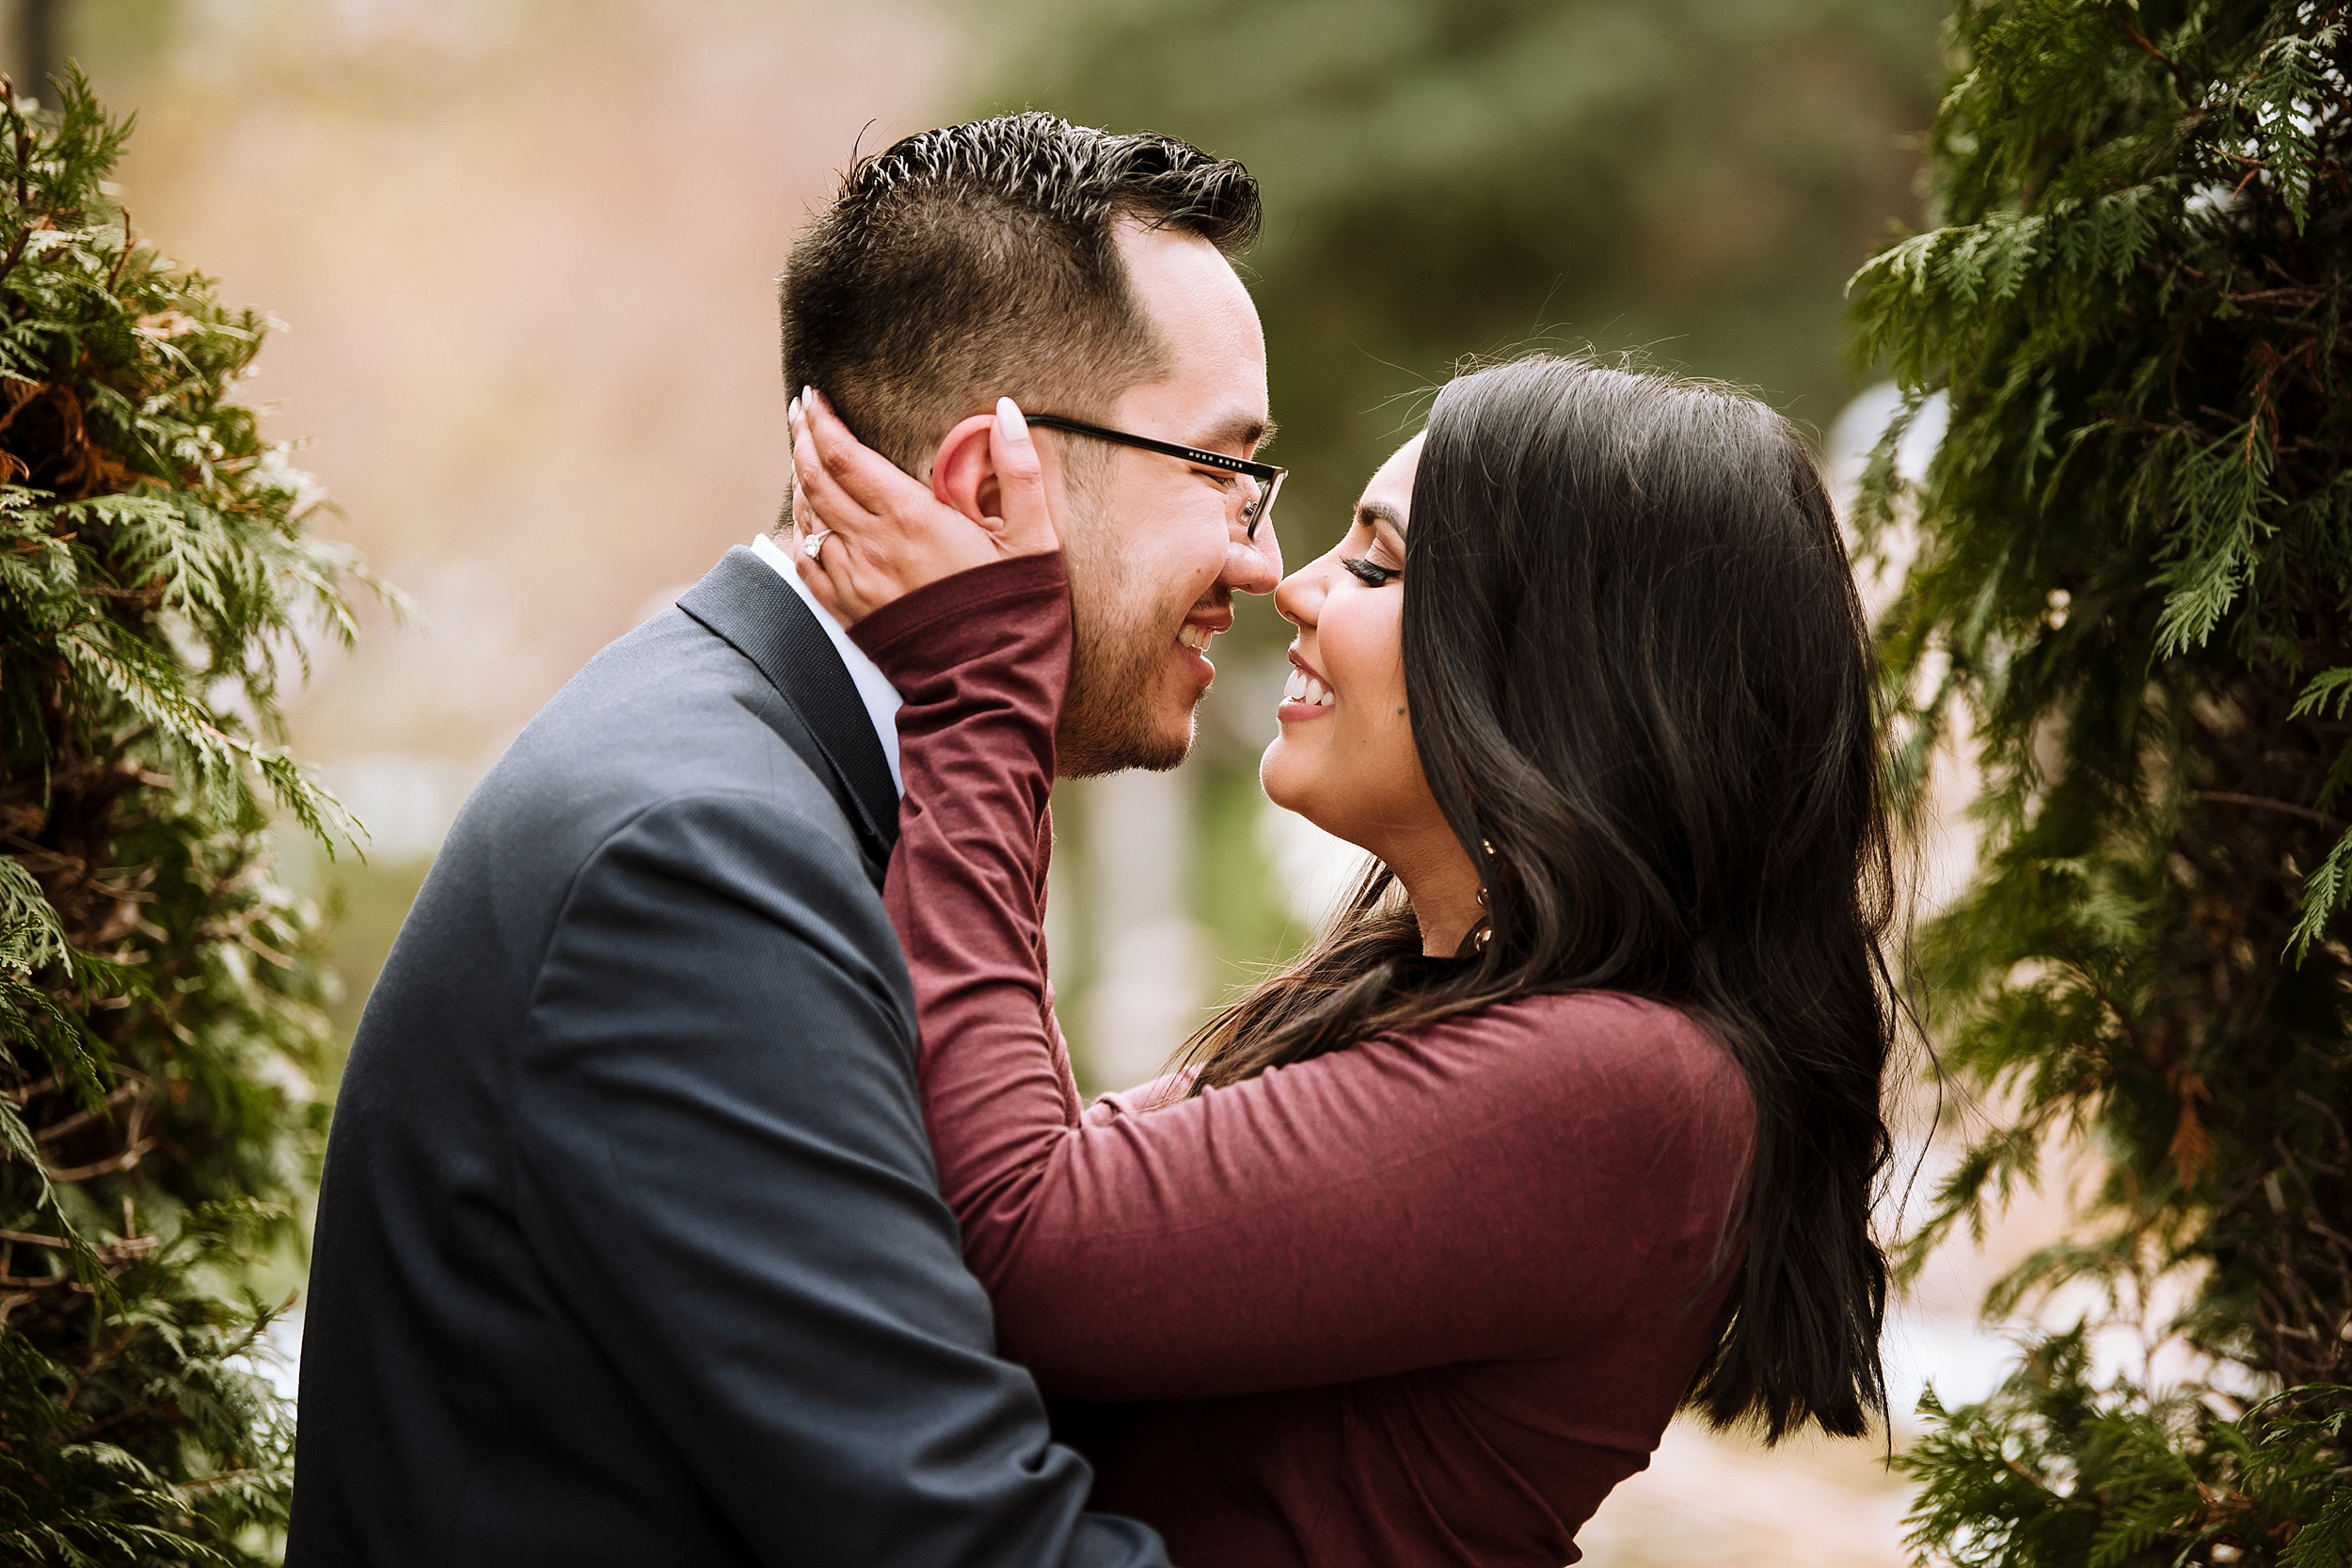 Alexander_Muir_Memorial_Gardens_Engagement_Shoot_Toronto_Wedding_Photographer_0015.jpg